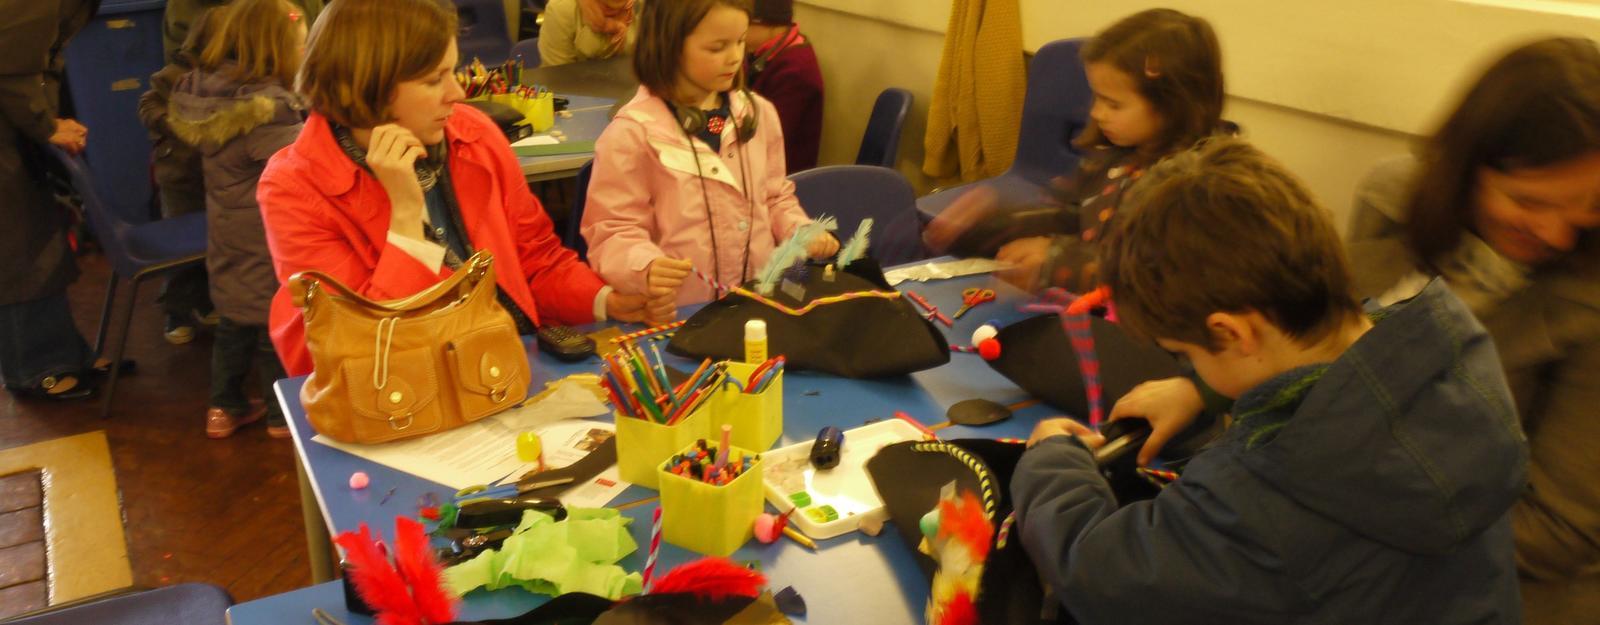 Family Activities at the Royal Mews